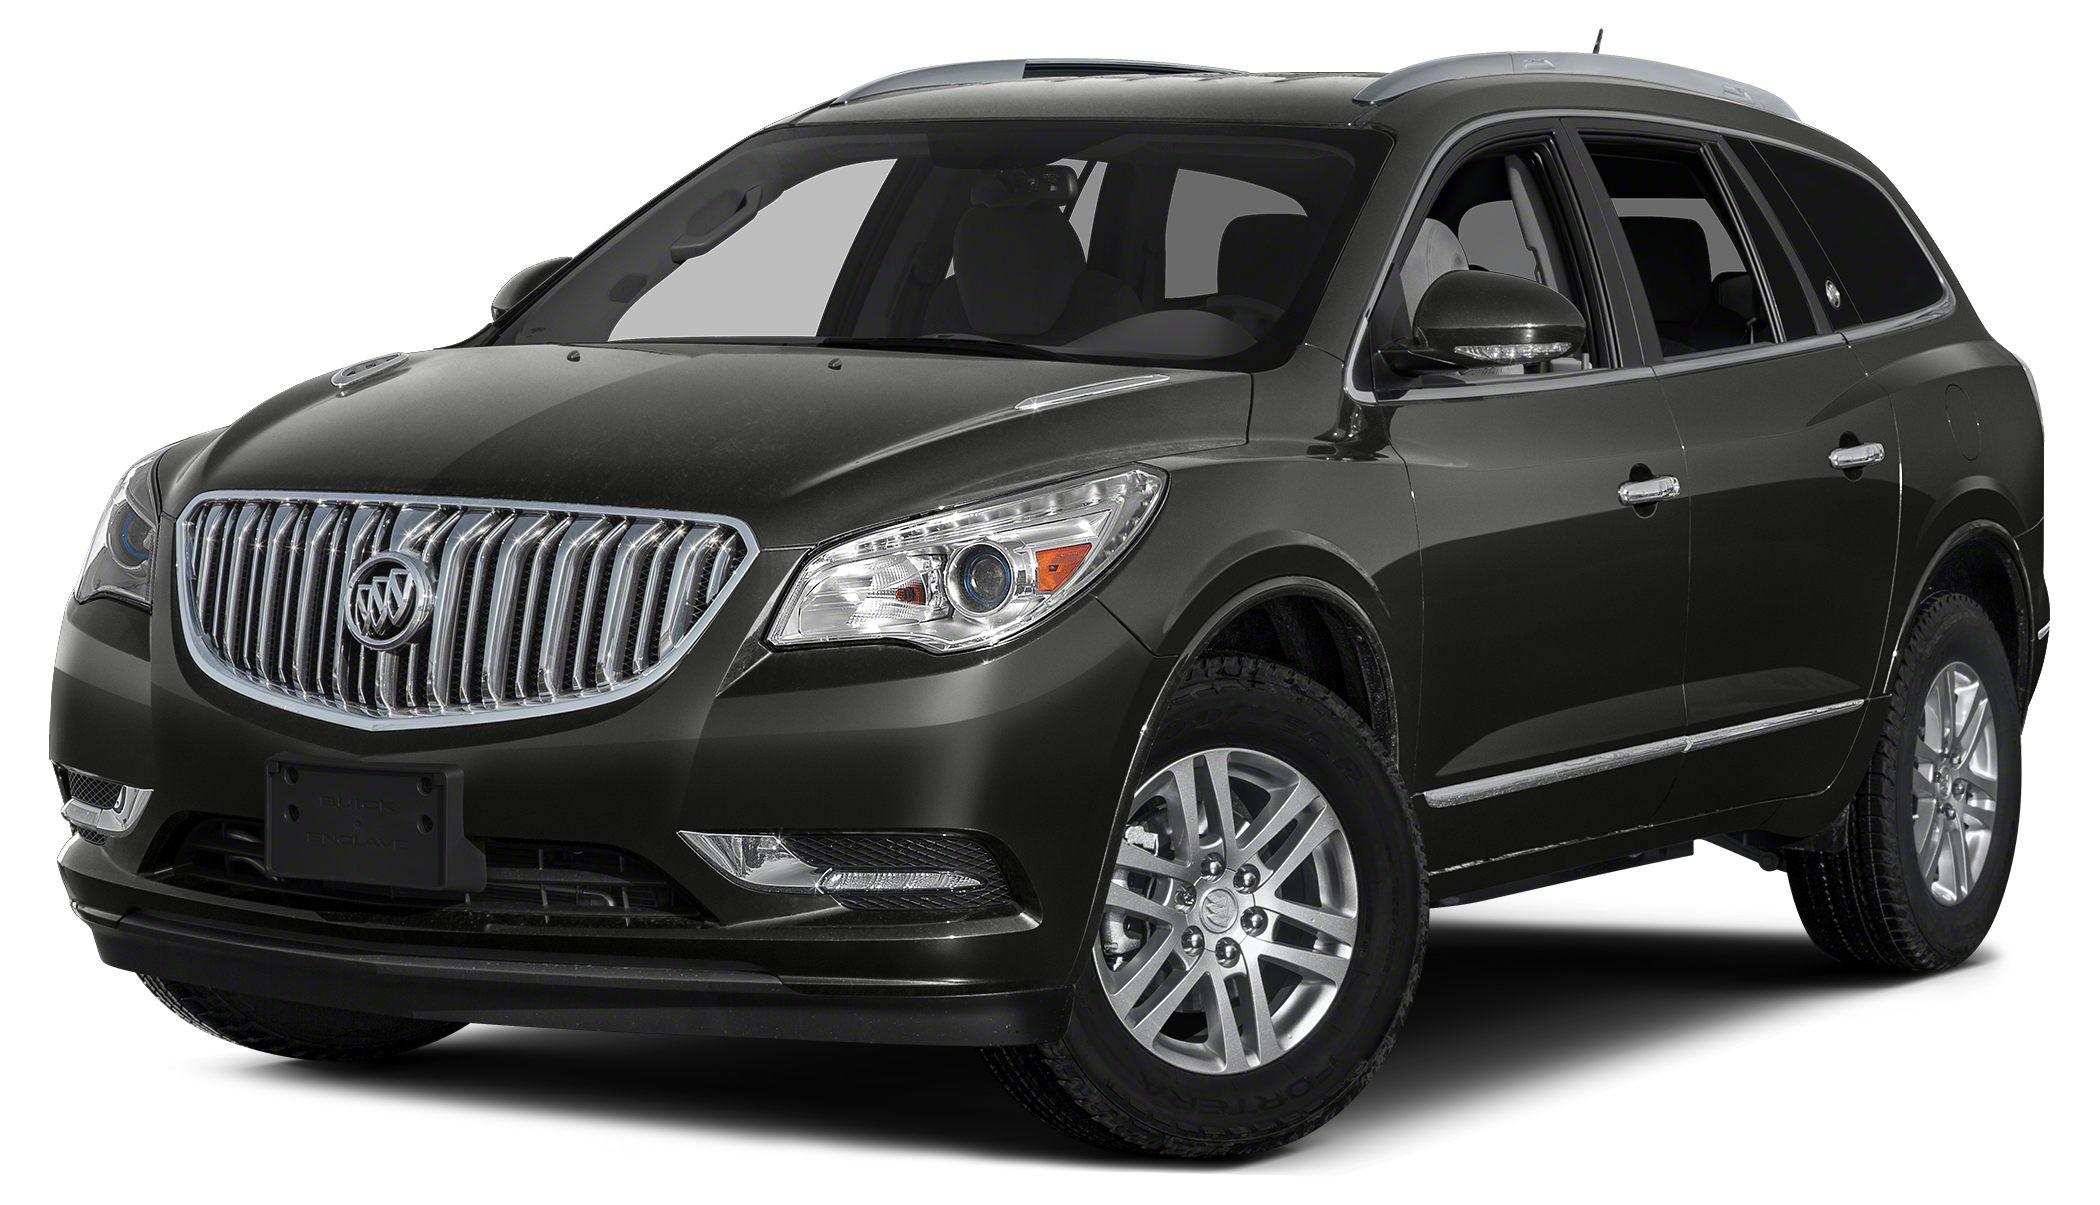 2017 Buick Enclave Leather Miles 0Color Gray Stock 11721 VIN 5GAKRBKD3HJ236031